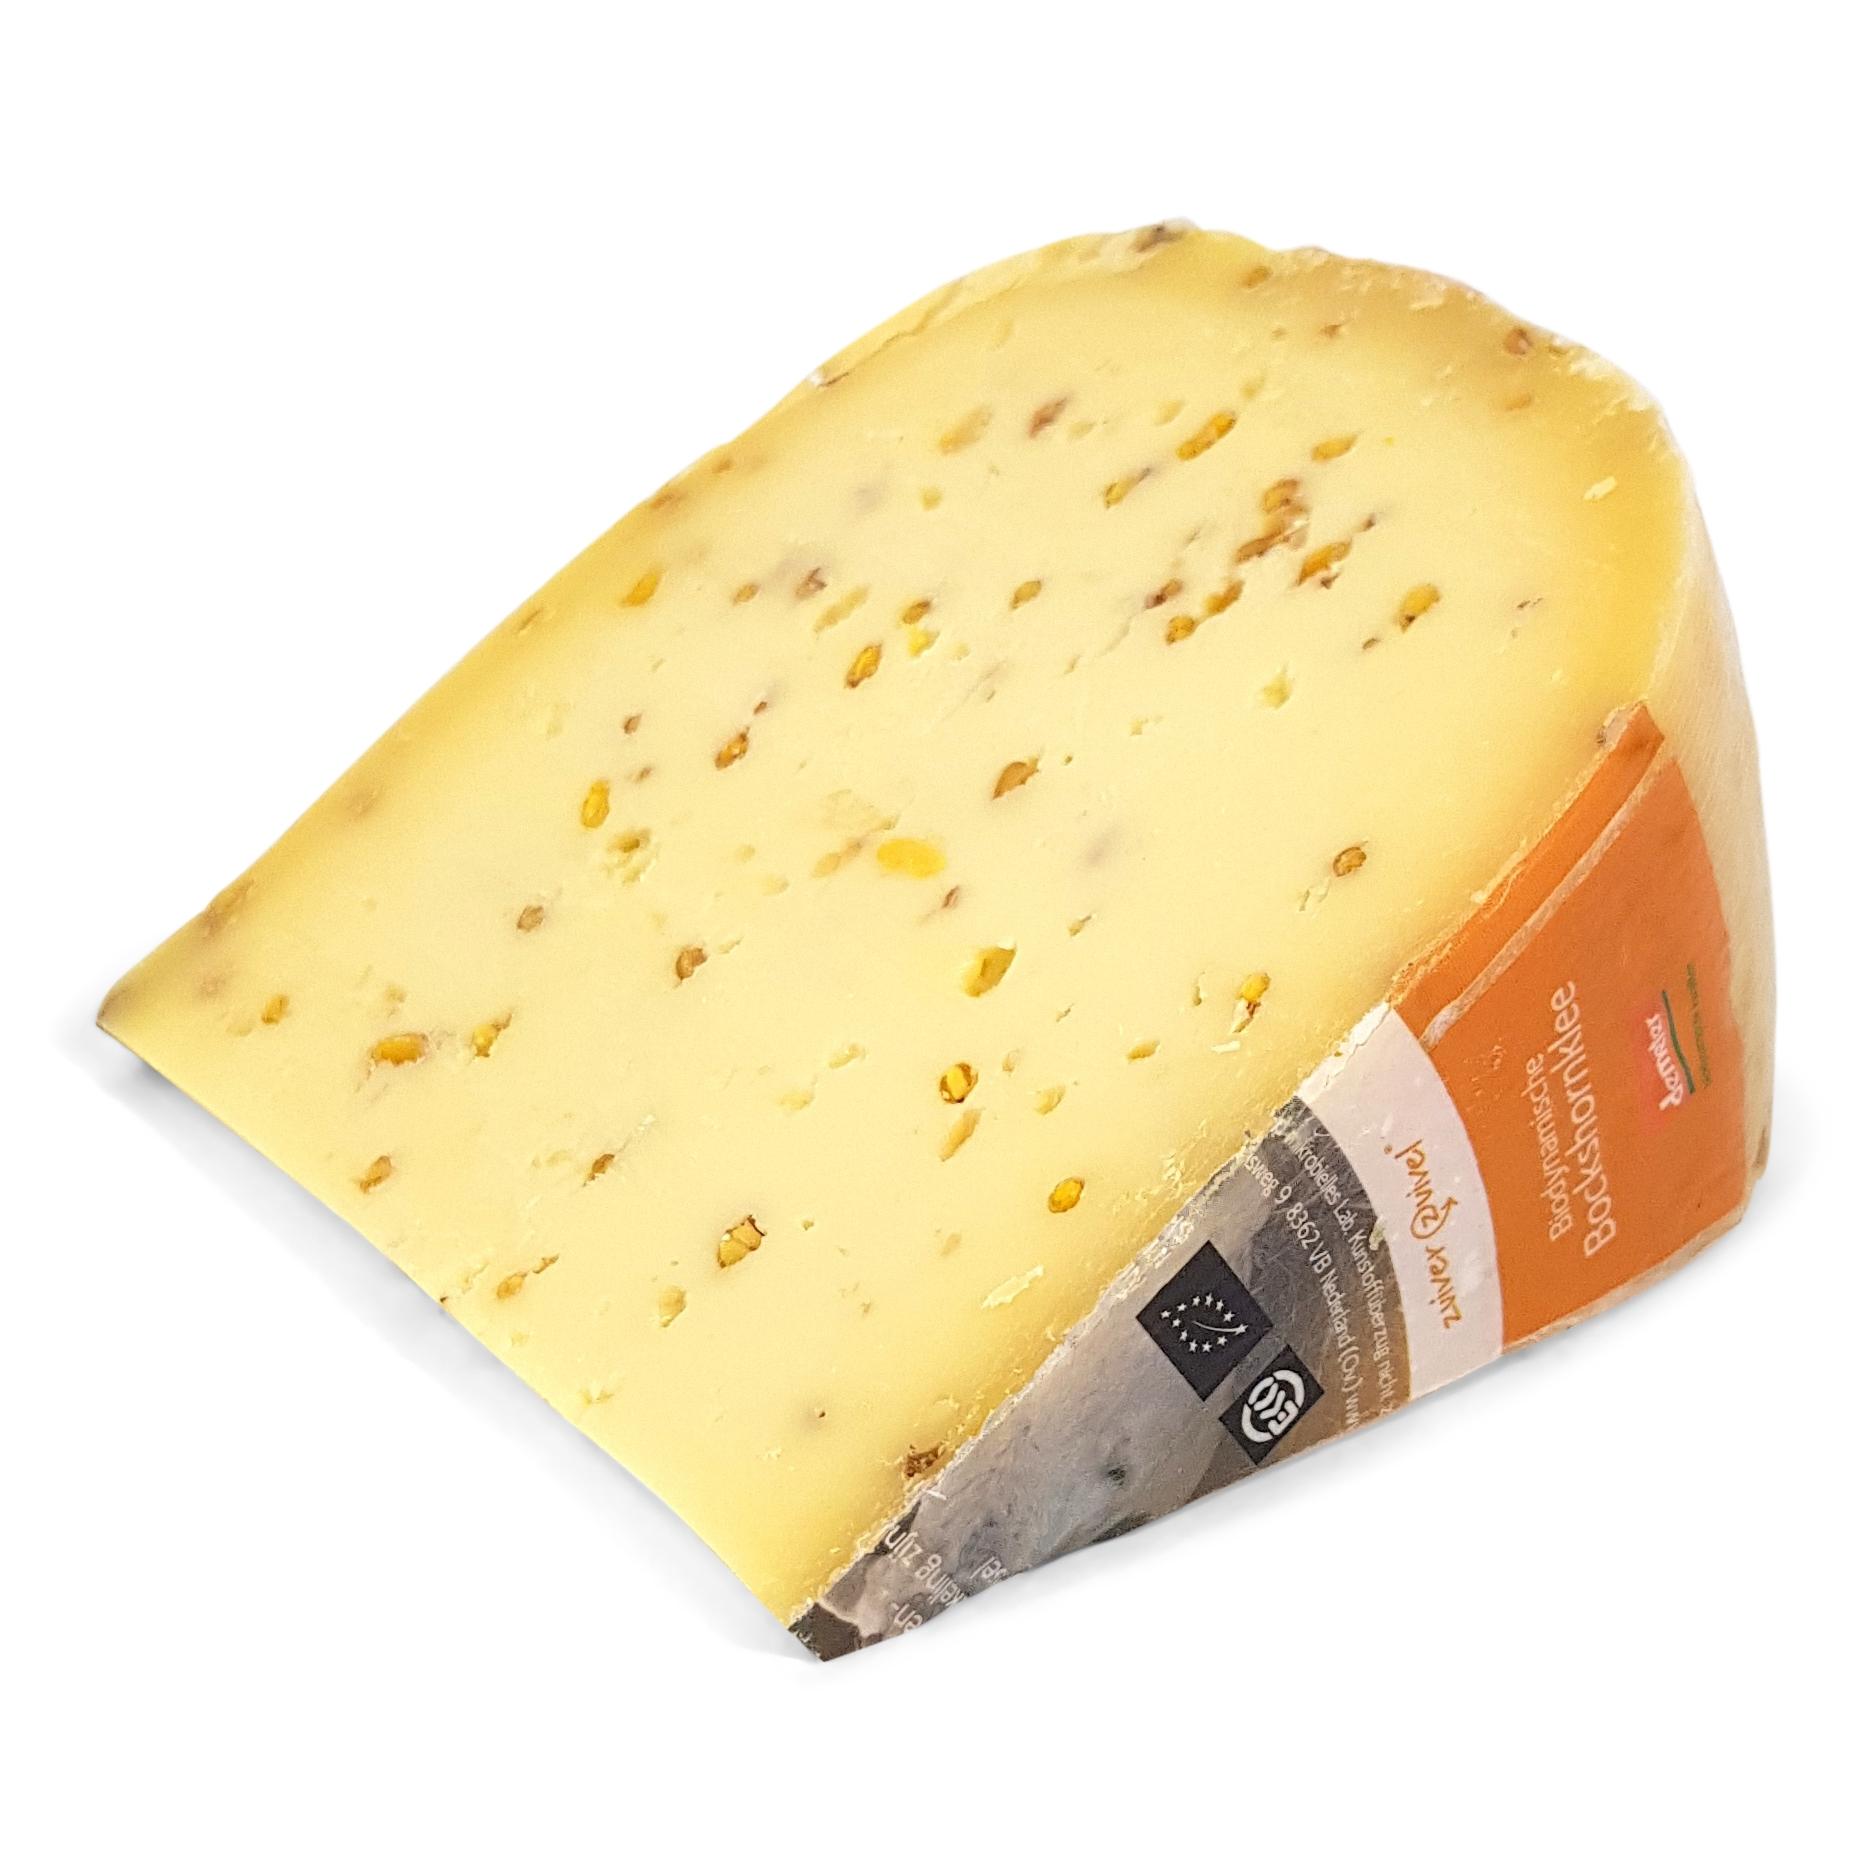 500gr Fenegriek Goudse Biologisch vegetarisch dynamische kaas - Demeter 50+